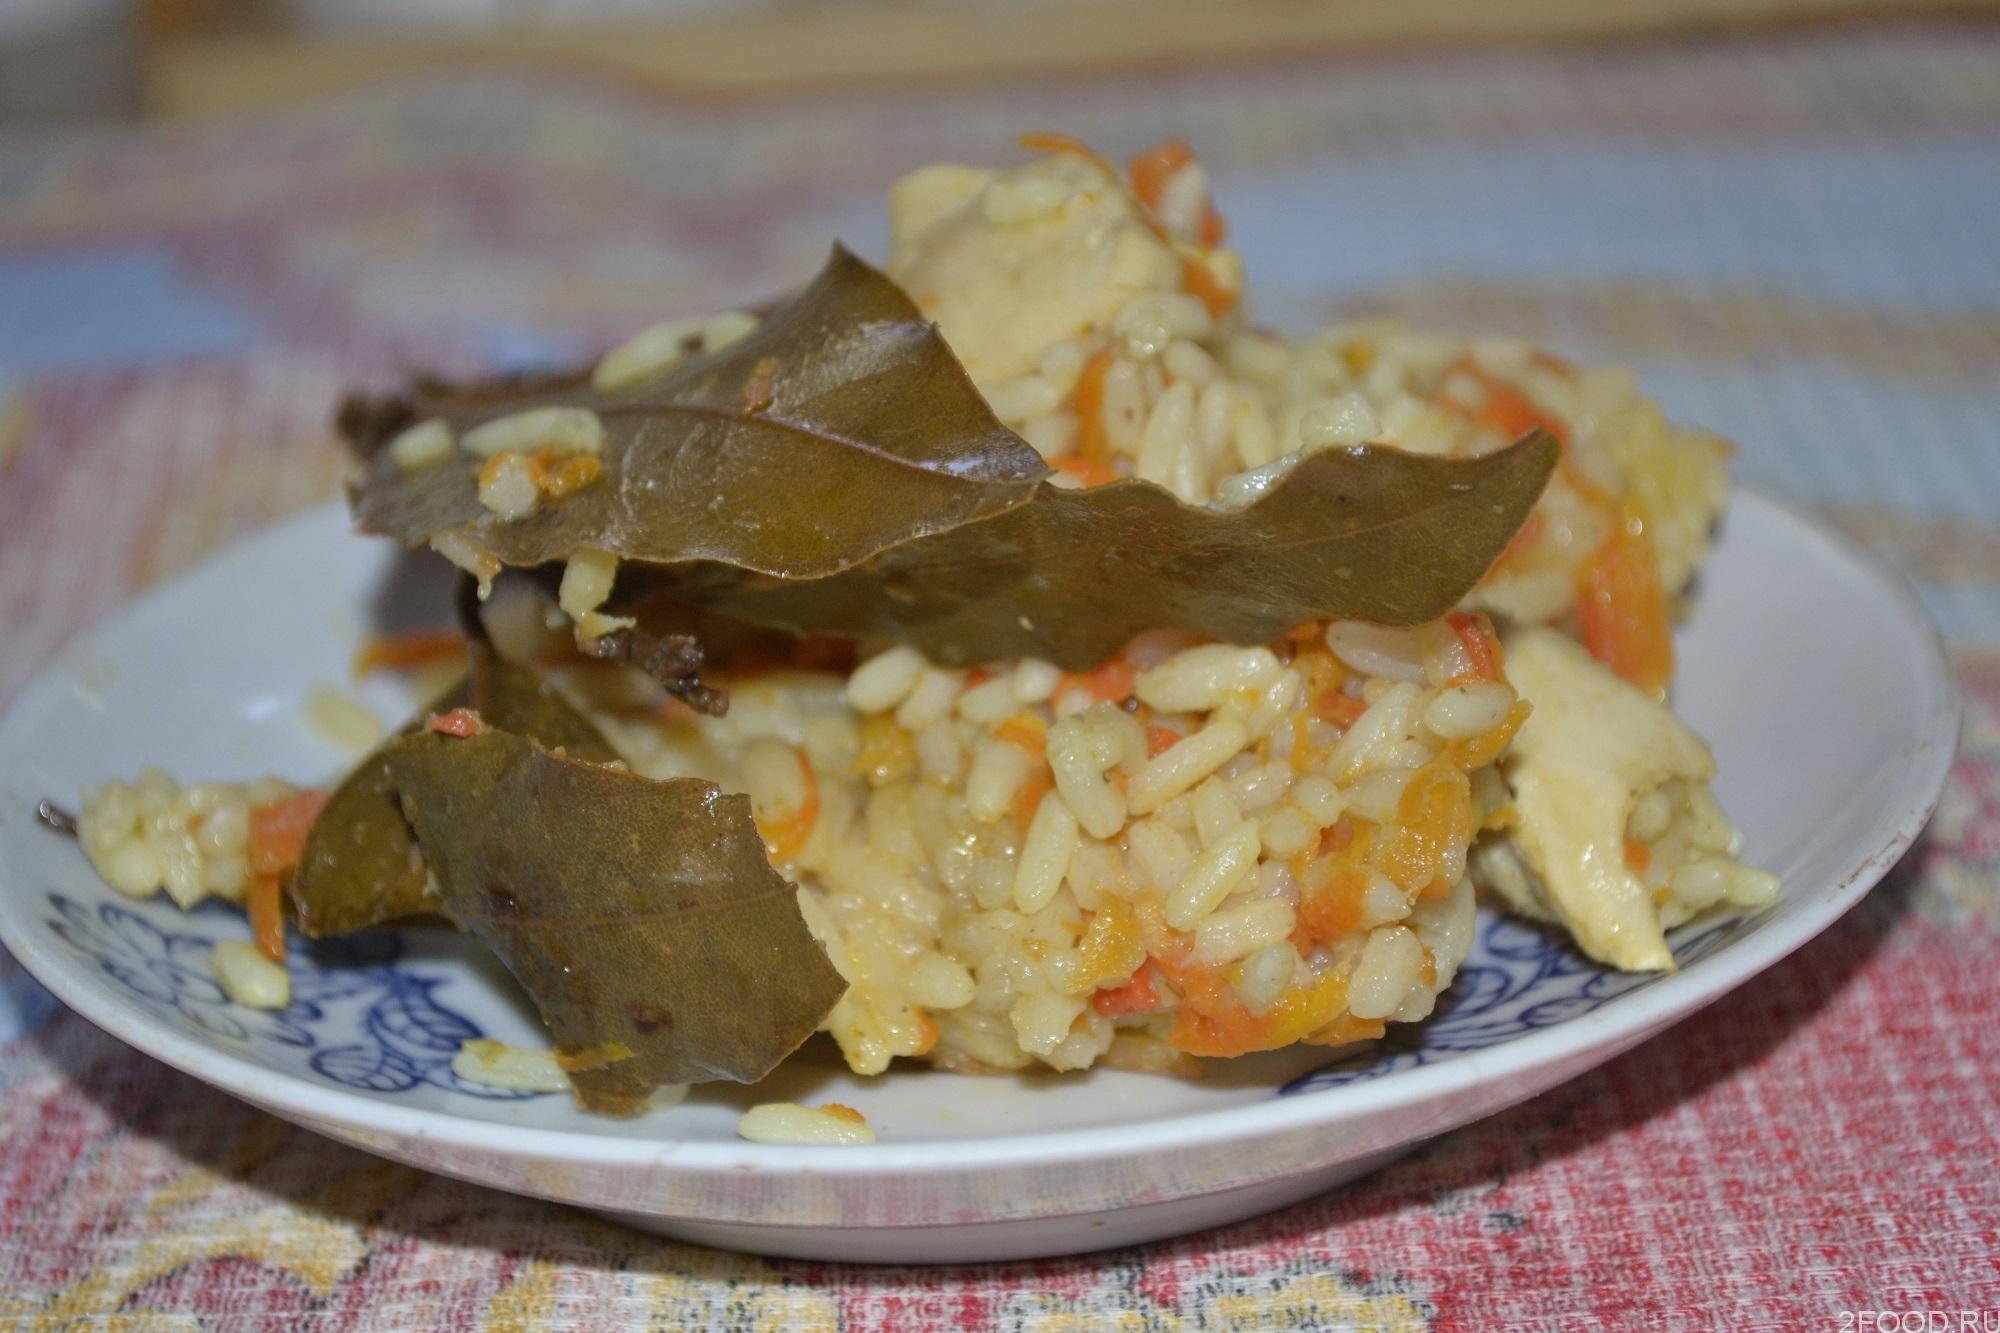 Рецепт плова с филе курицы с фото пошагово